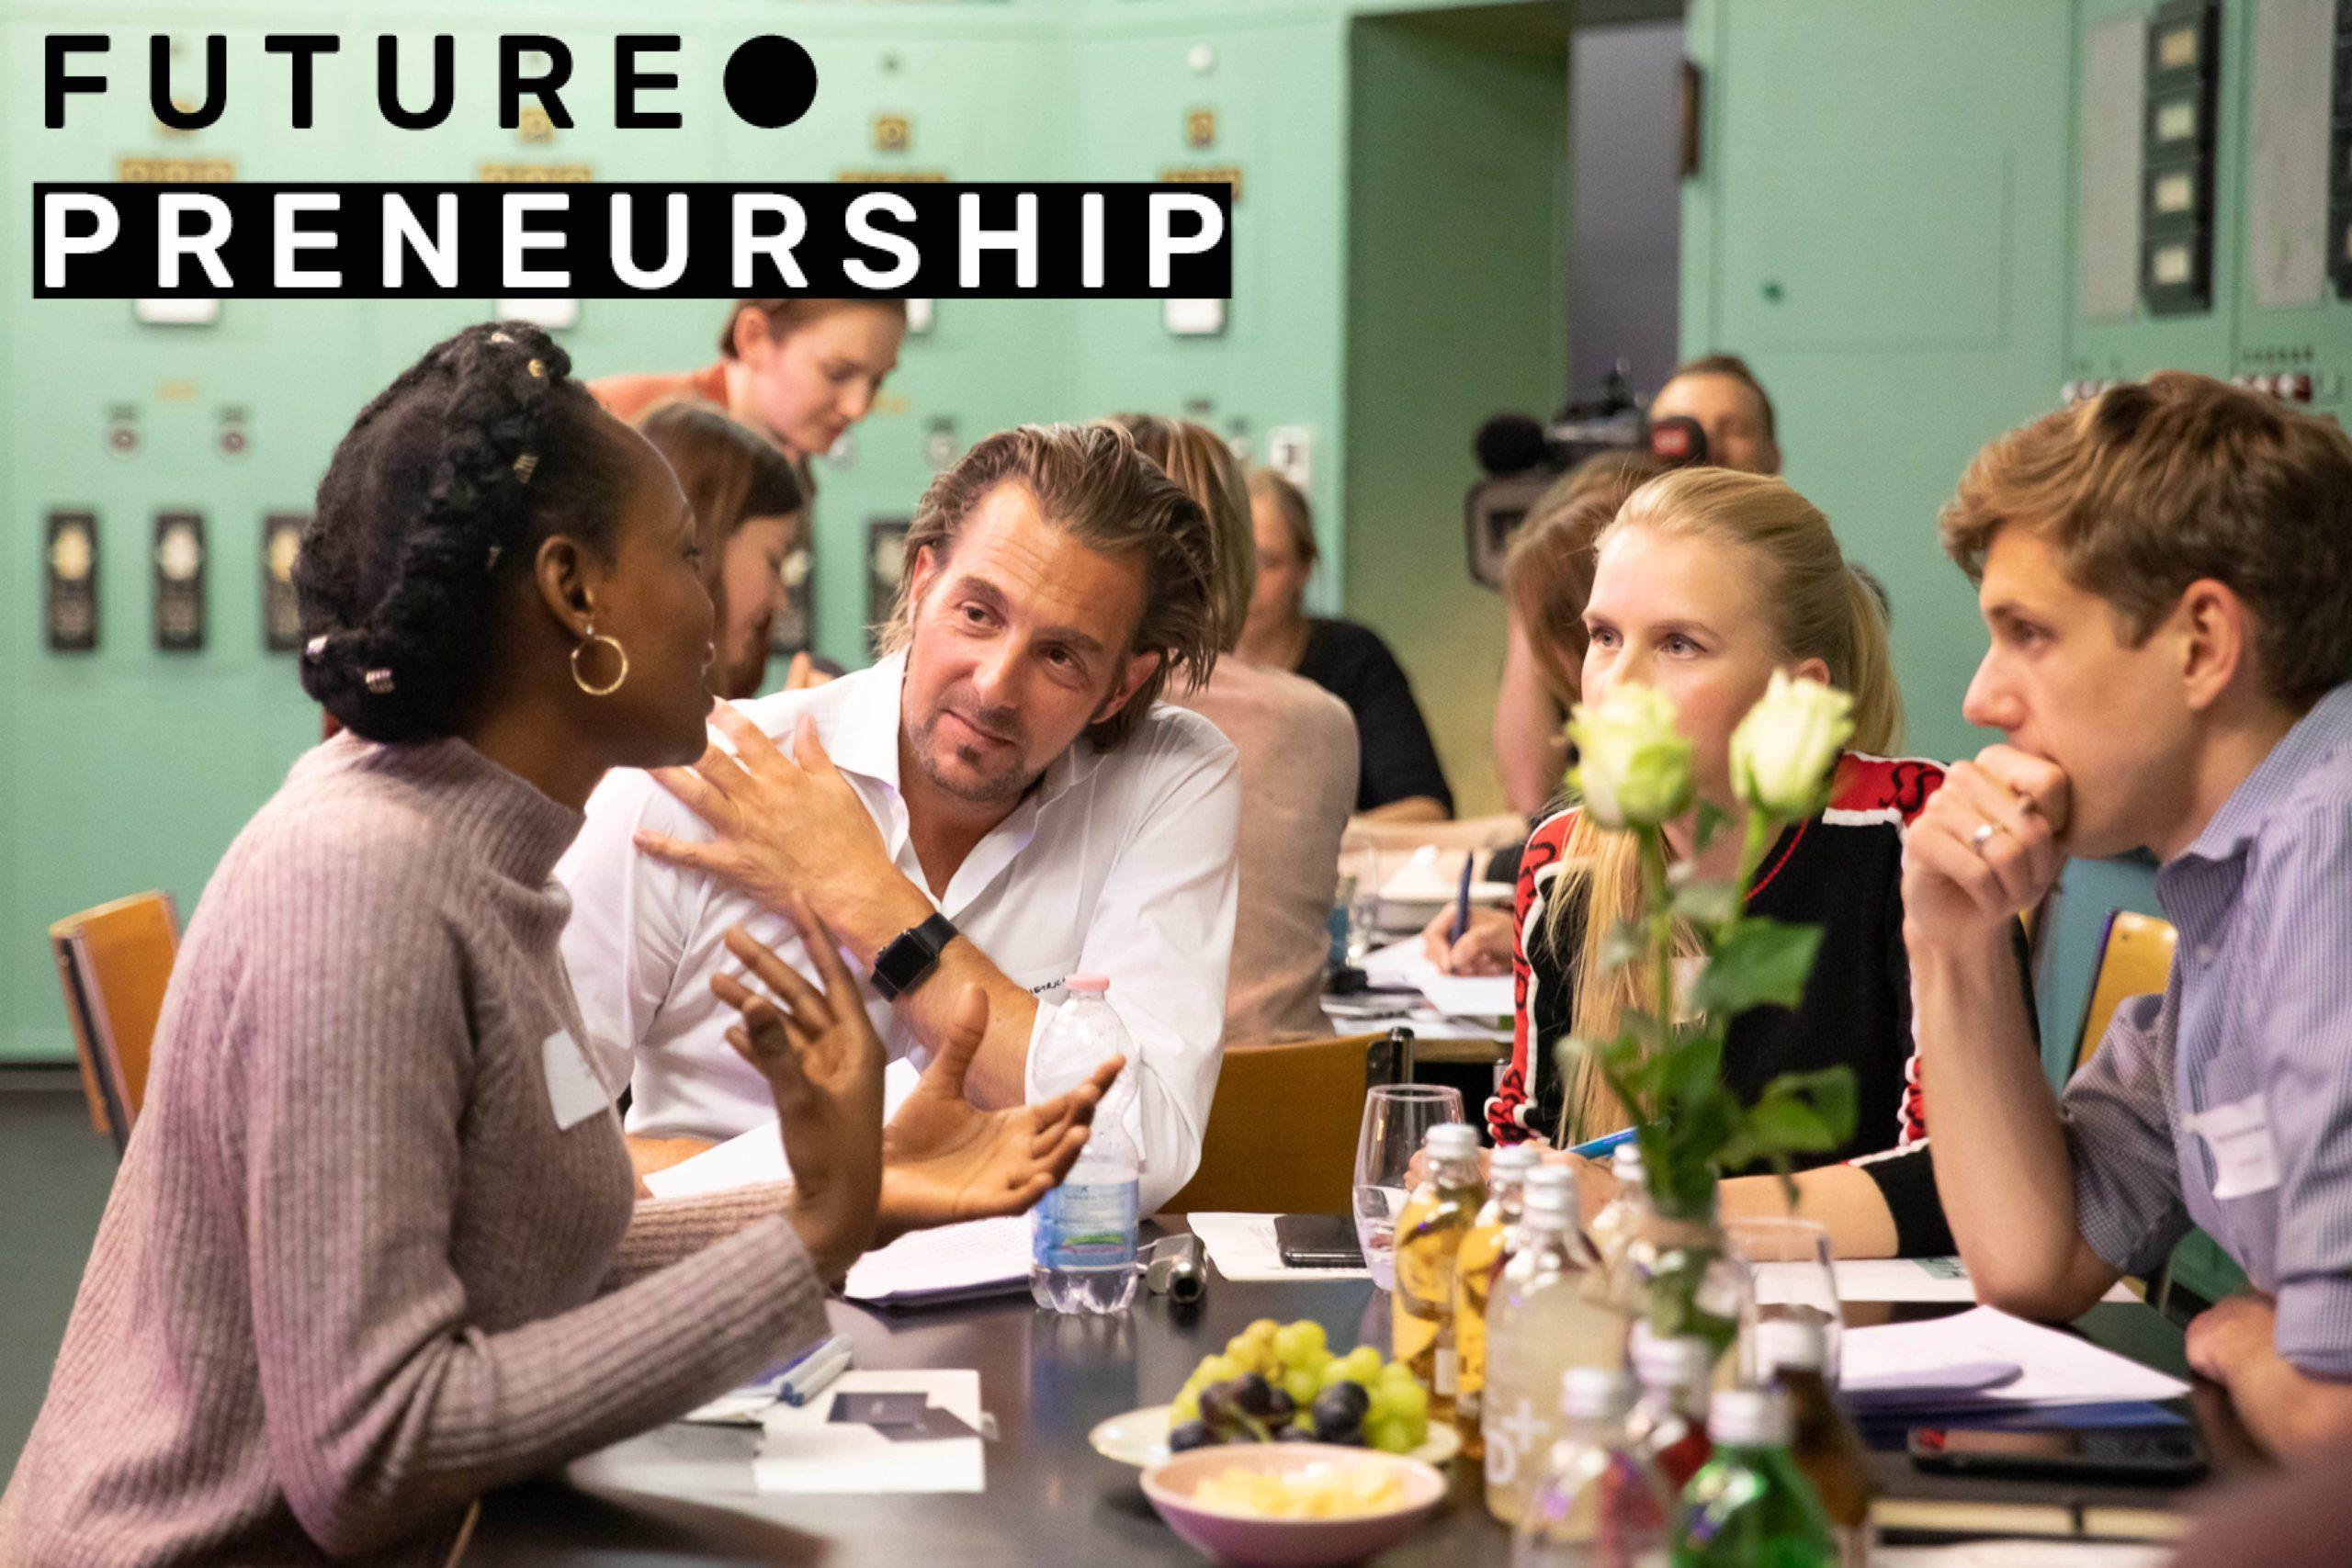 FuturePreneurship NewWork Program